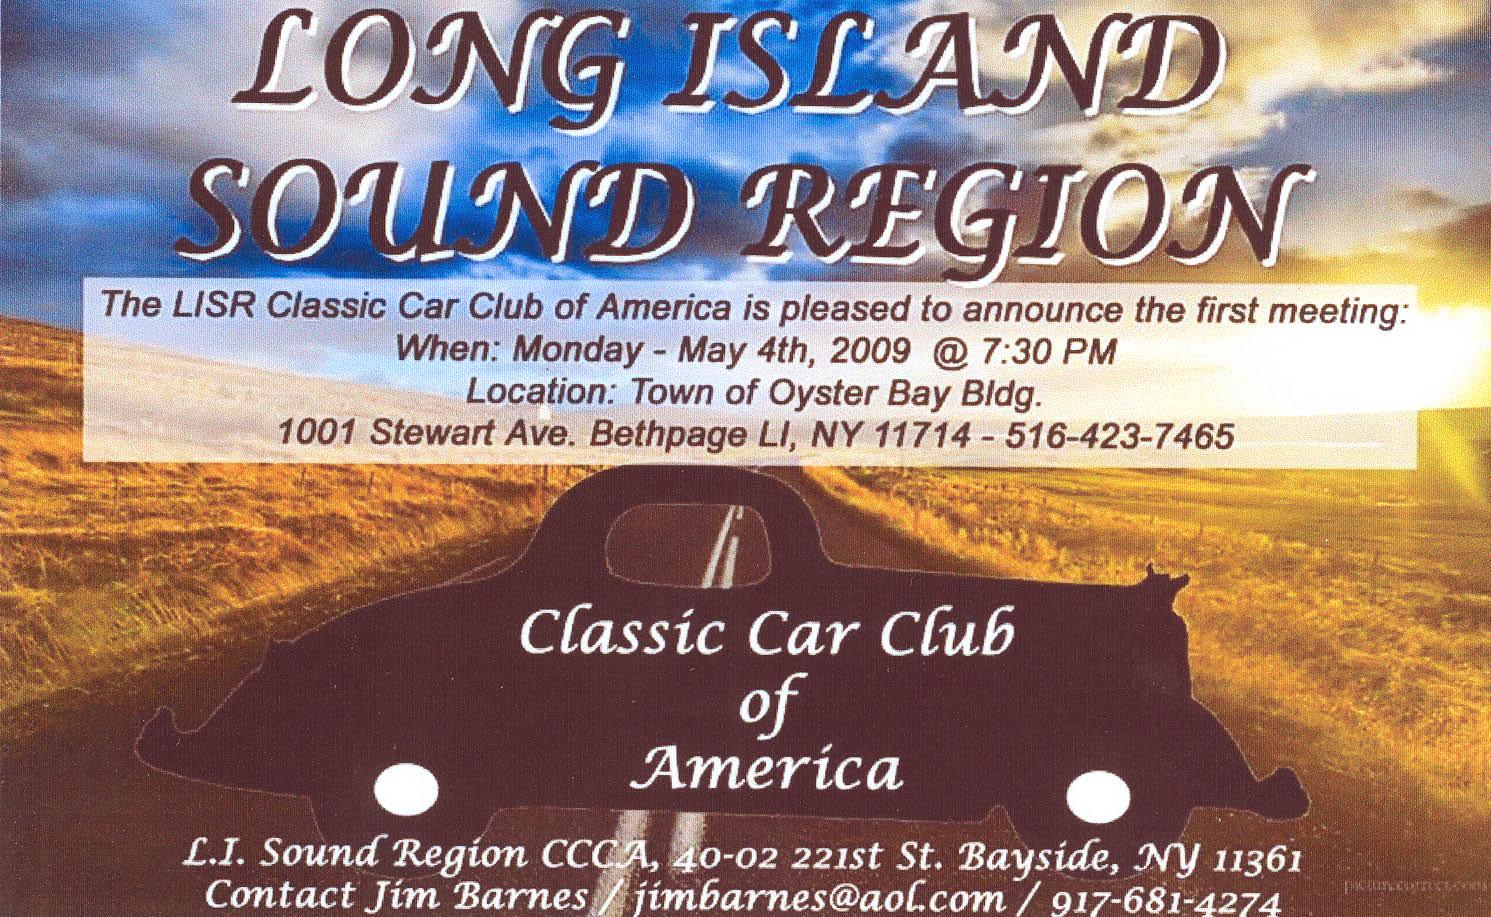 Region of the Classic Car